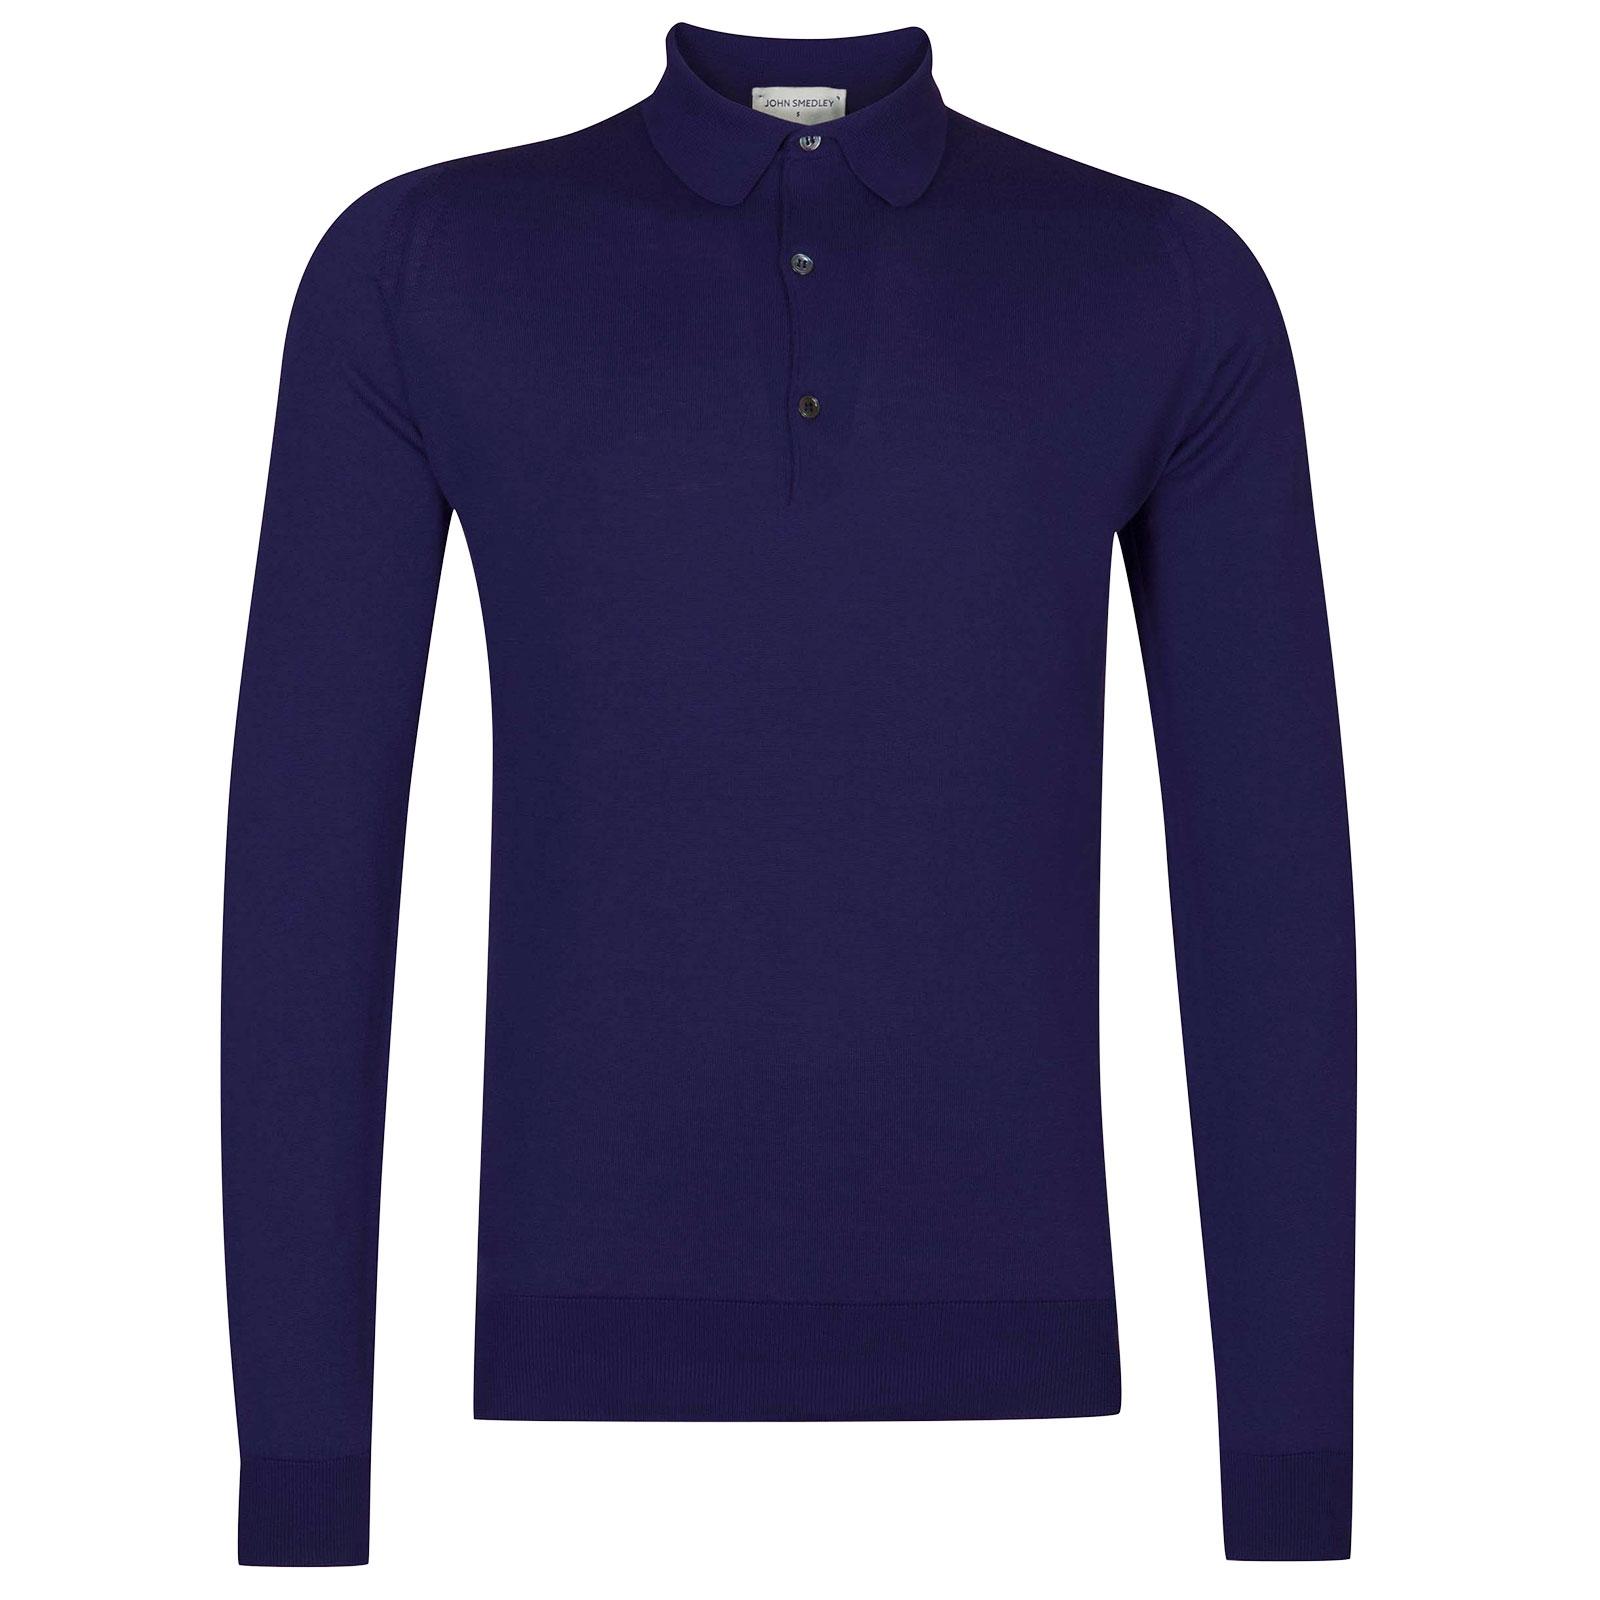 John Smedley Bradwell Sea Island Cotton Shirt in Serge Blue-XXL